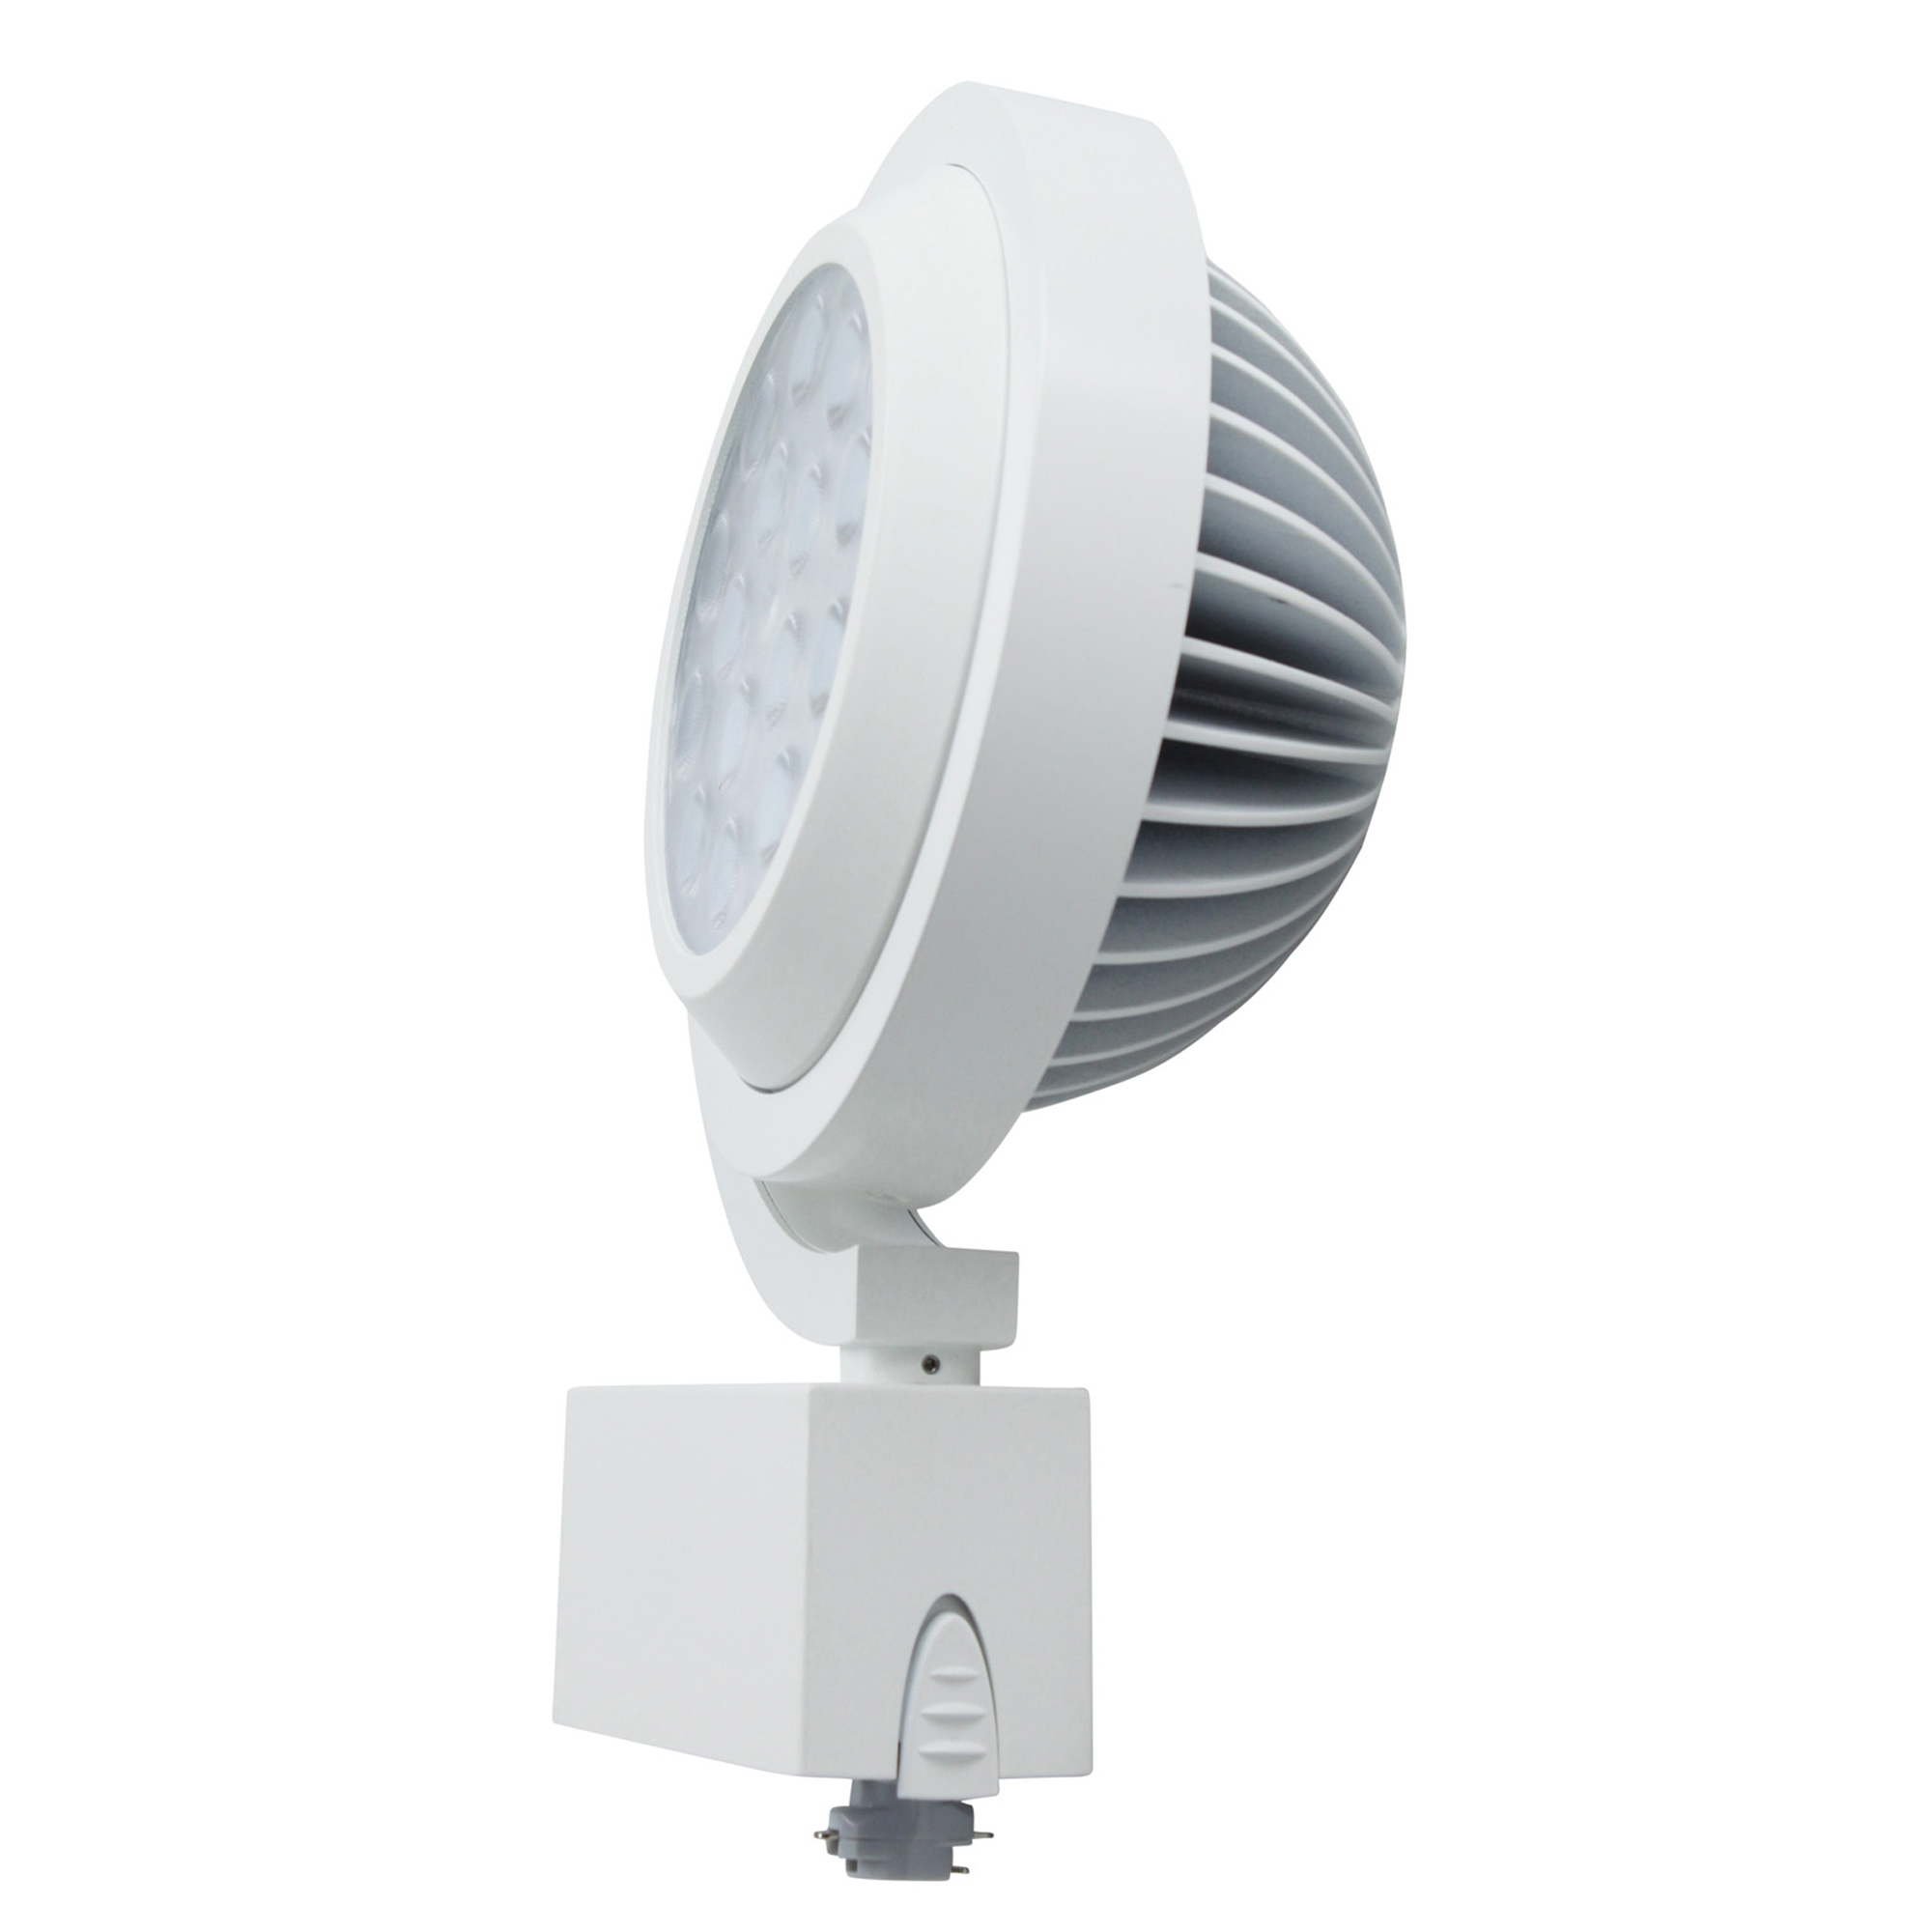 HALO LIGHTING L806HONF8030P L806 LED TRACK HEAD TRACK